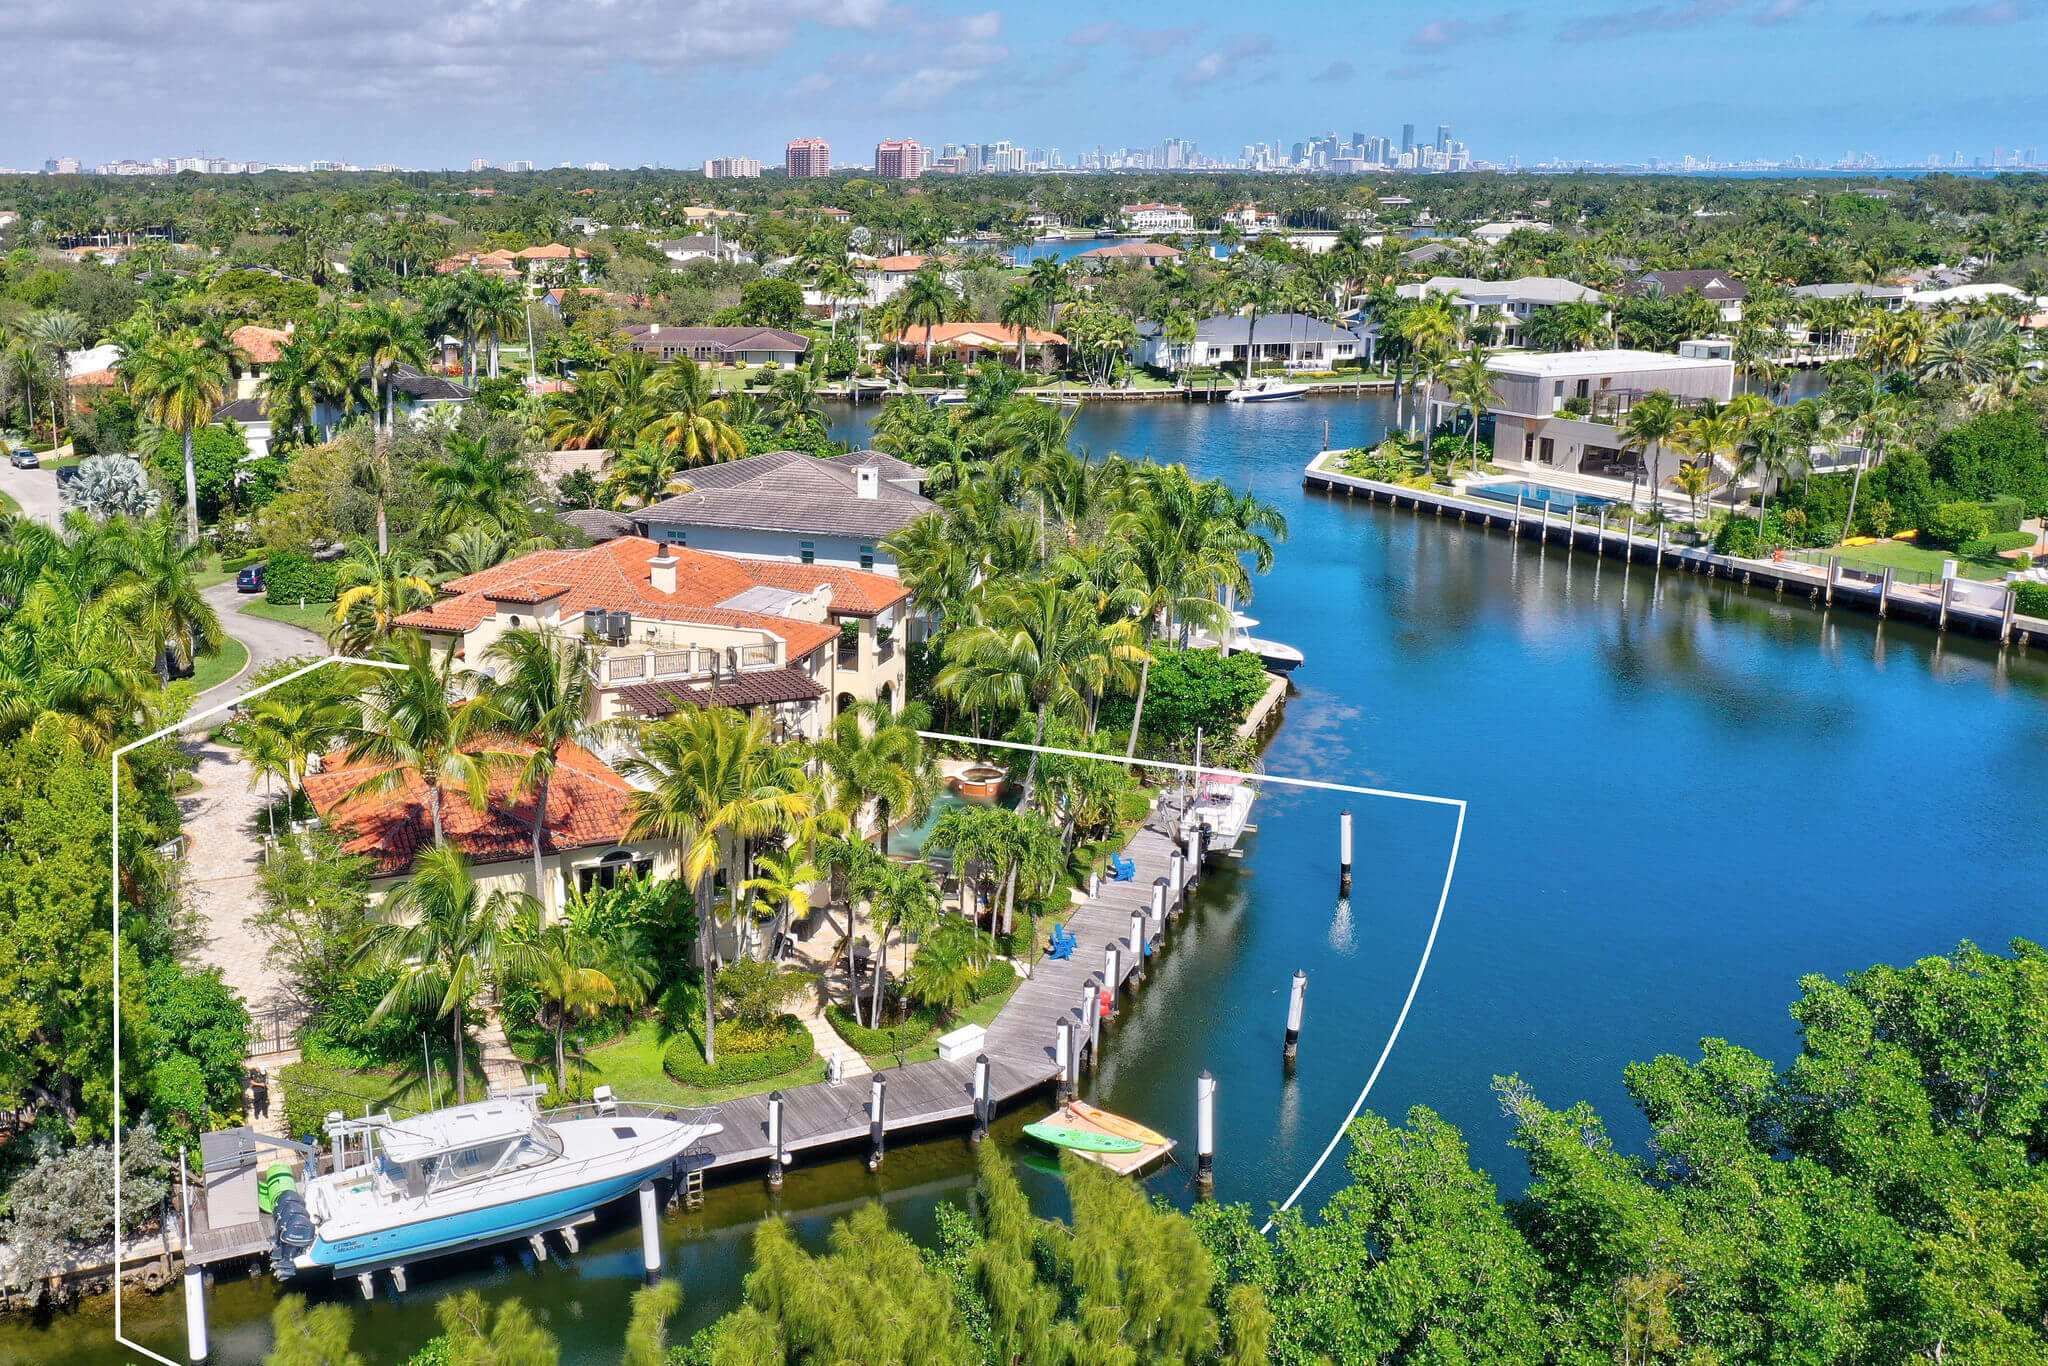 11_outline_photo_by_MiamiRealEstatePhotographers.com.jpg